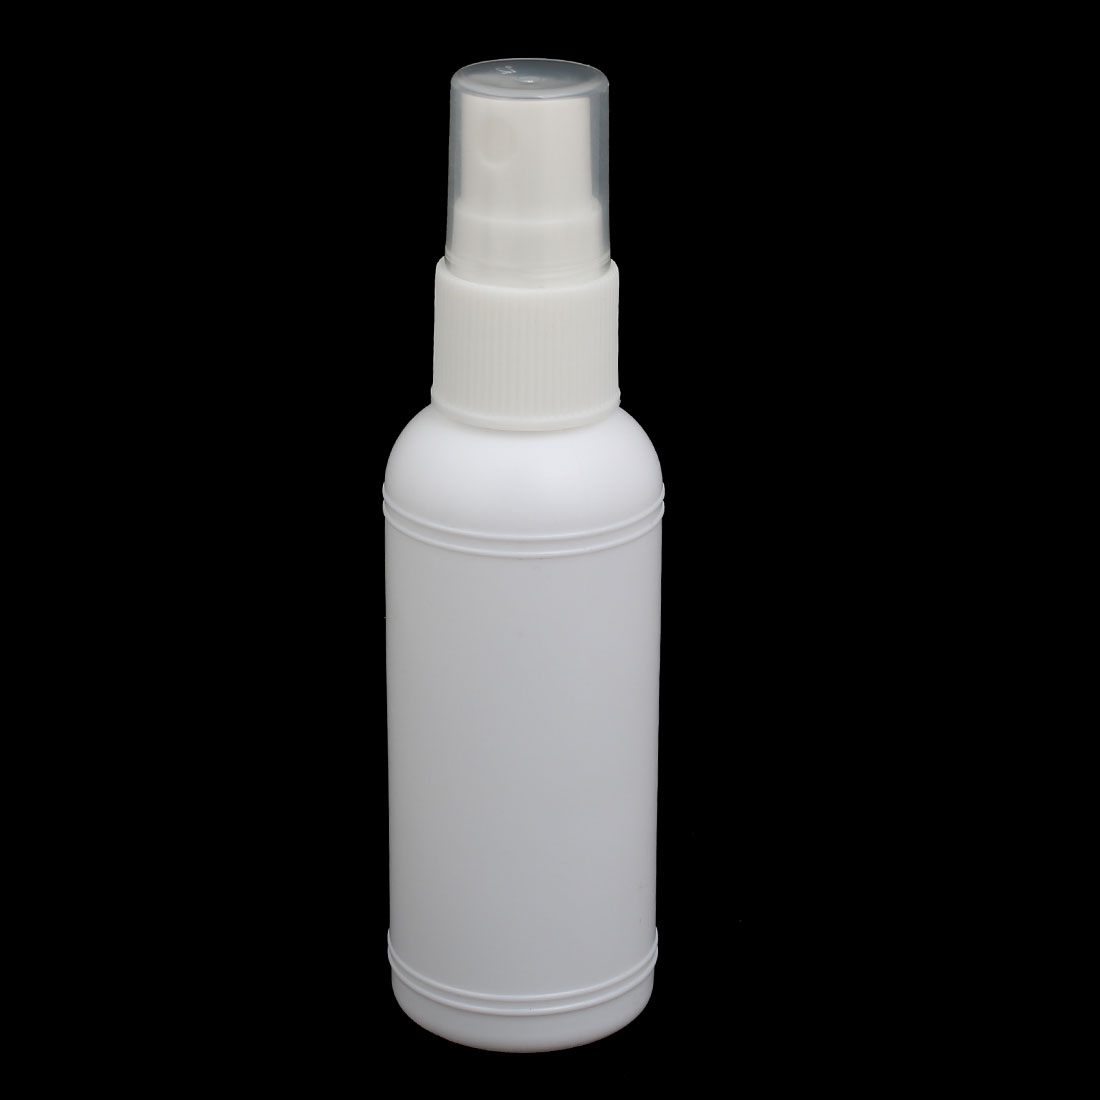 50ml PE Plastic Cylinder Shape DIY Water Spray Bottle White 2pcs - image 1 of 4